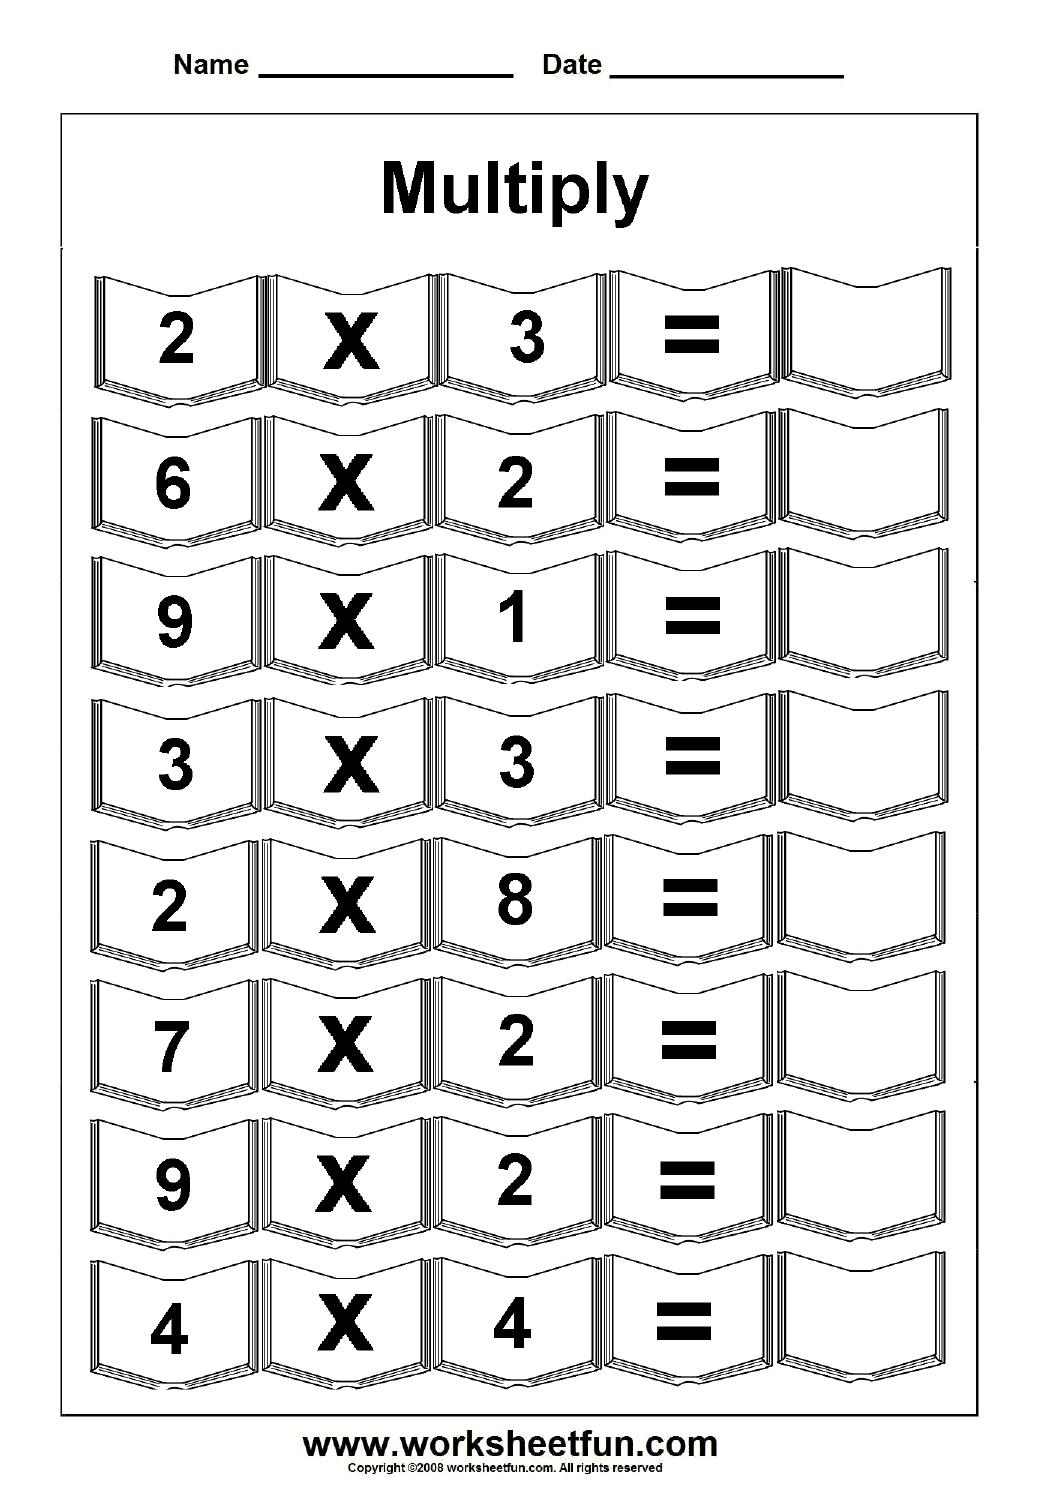 Multiplication – 5 Worksheets / Free Printable Worksheets – Worksheetfun - Free Printable Work Sheets